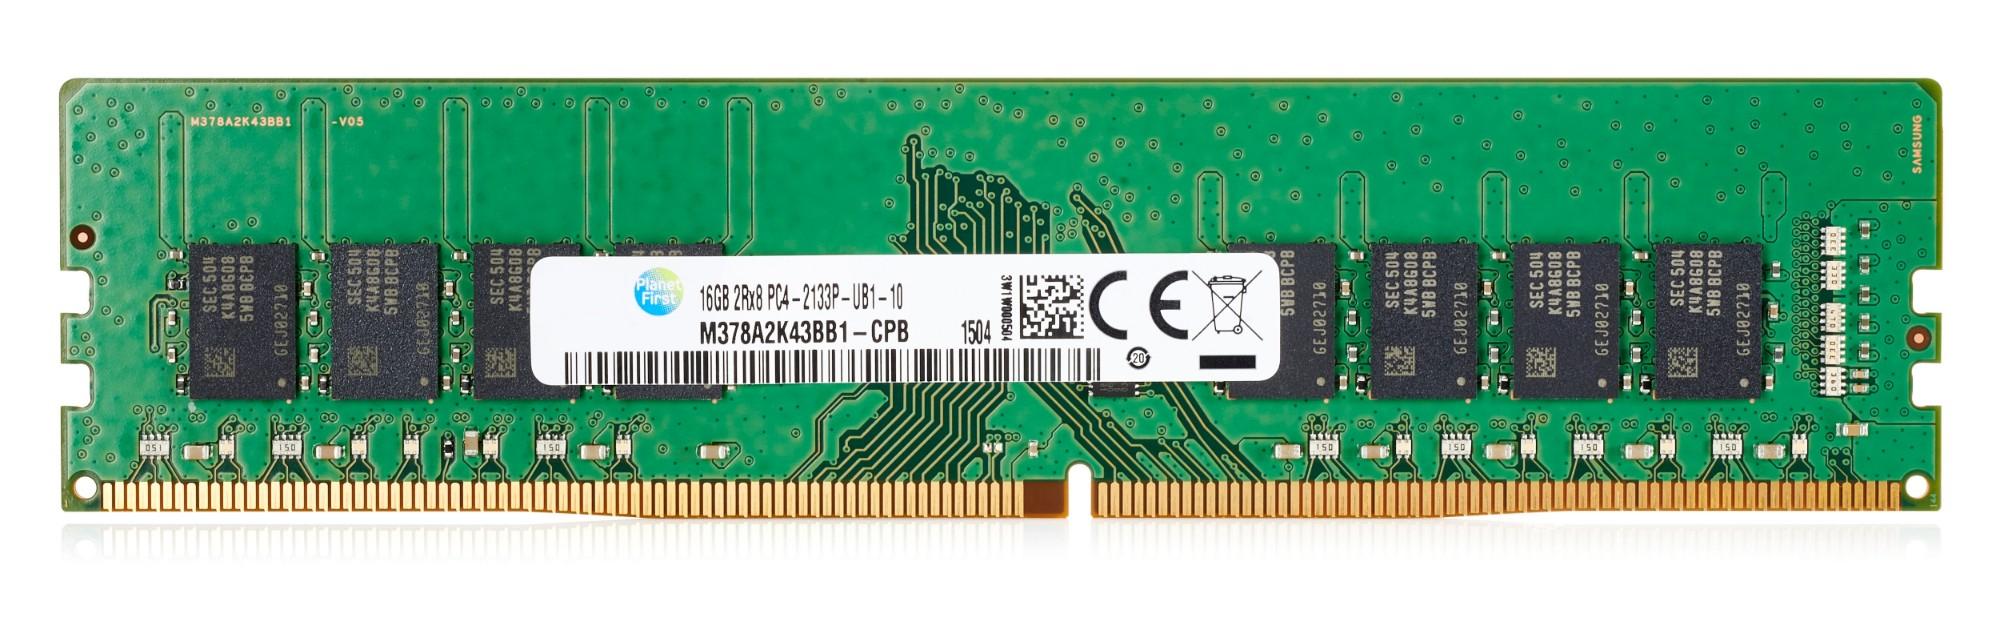 HP 8GB DDR4-2666 DIMM memory module 2666 MHz